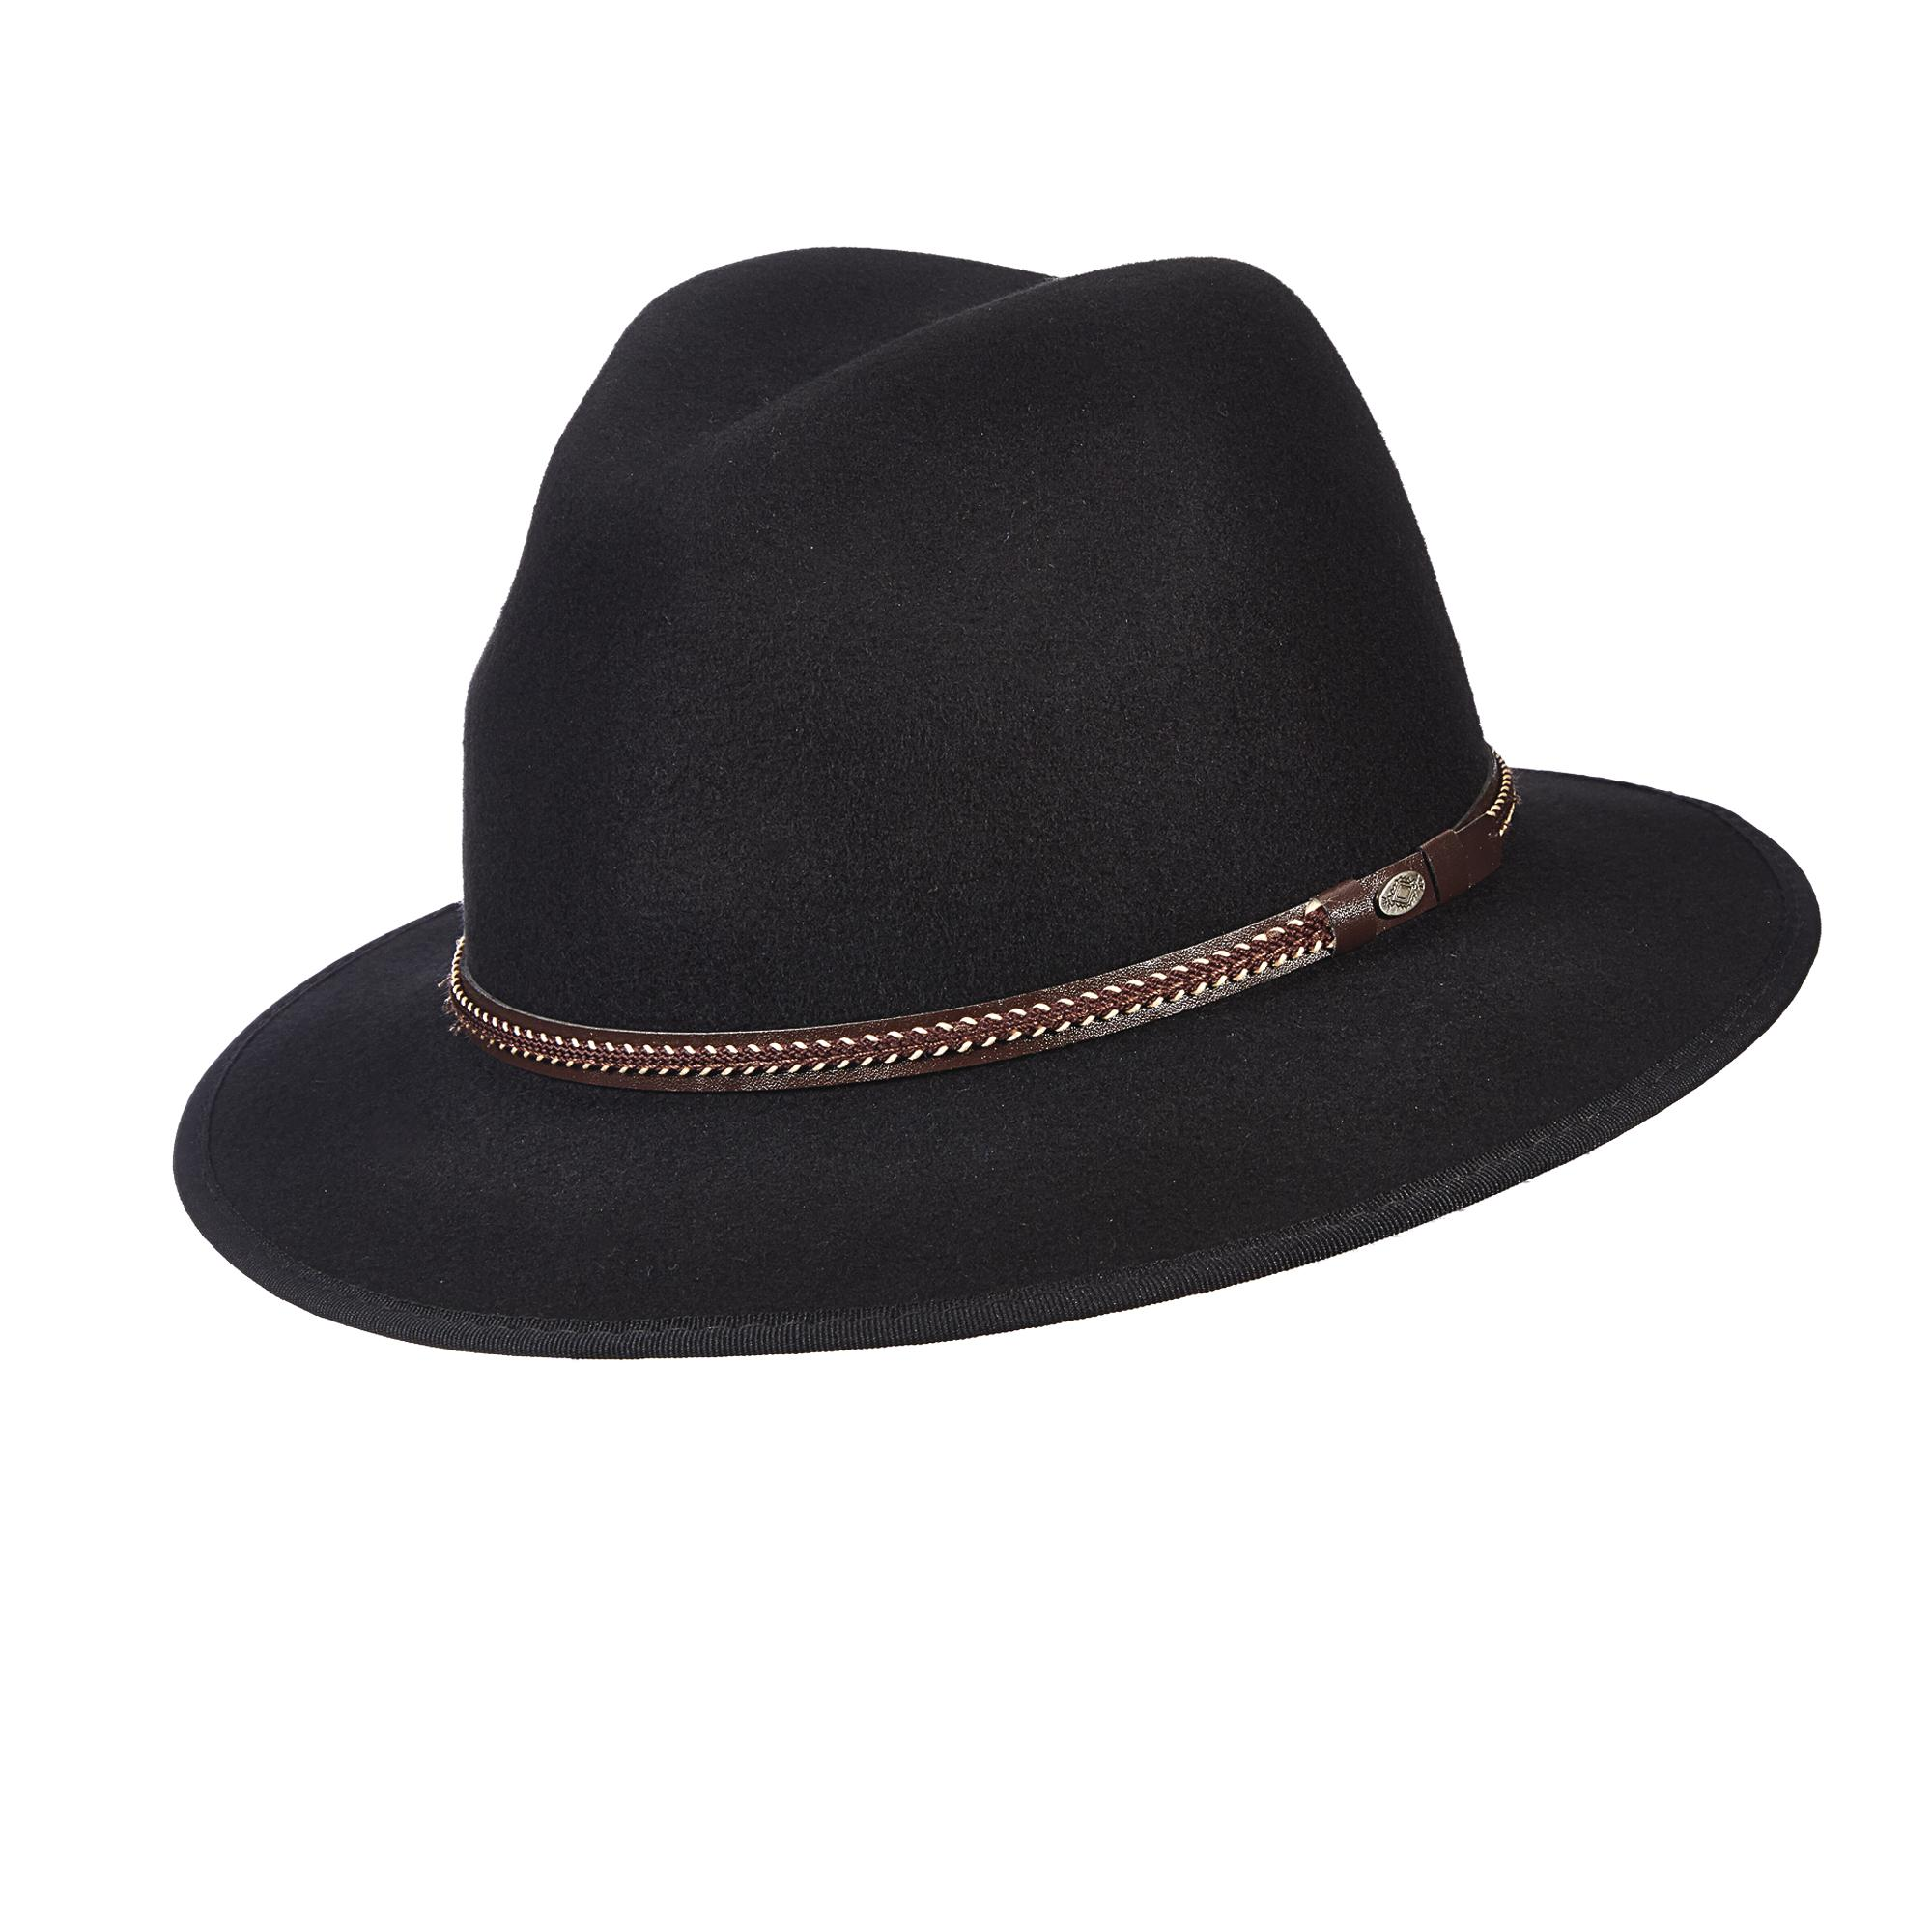 f5a5bae9d21 Details about New Scala Classico Men s Water Repellent Wool Felt Safari Hat